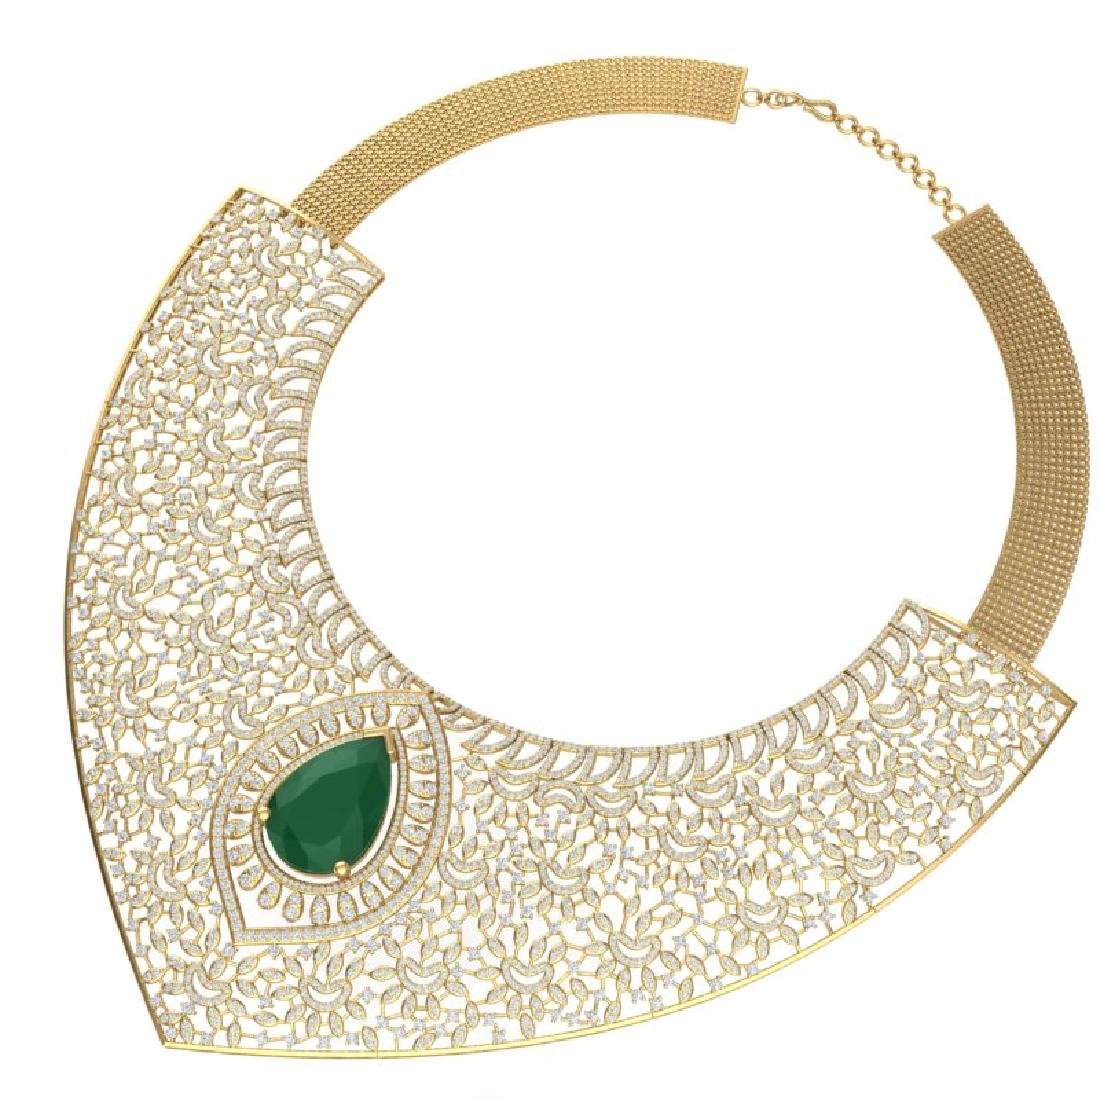 63.93 CTW Royalty Emerald & VS Diamond Necklace 18K - 2